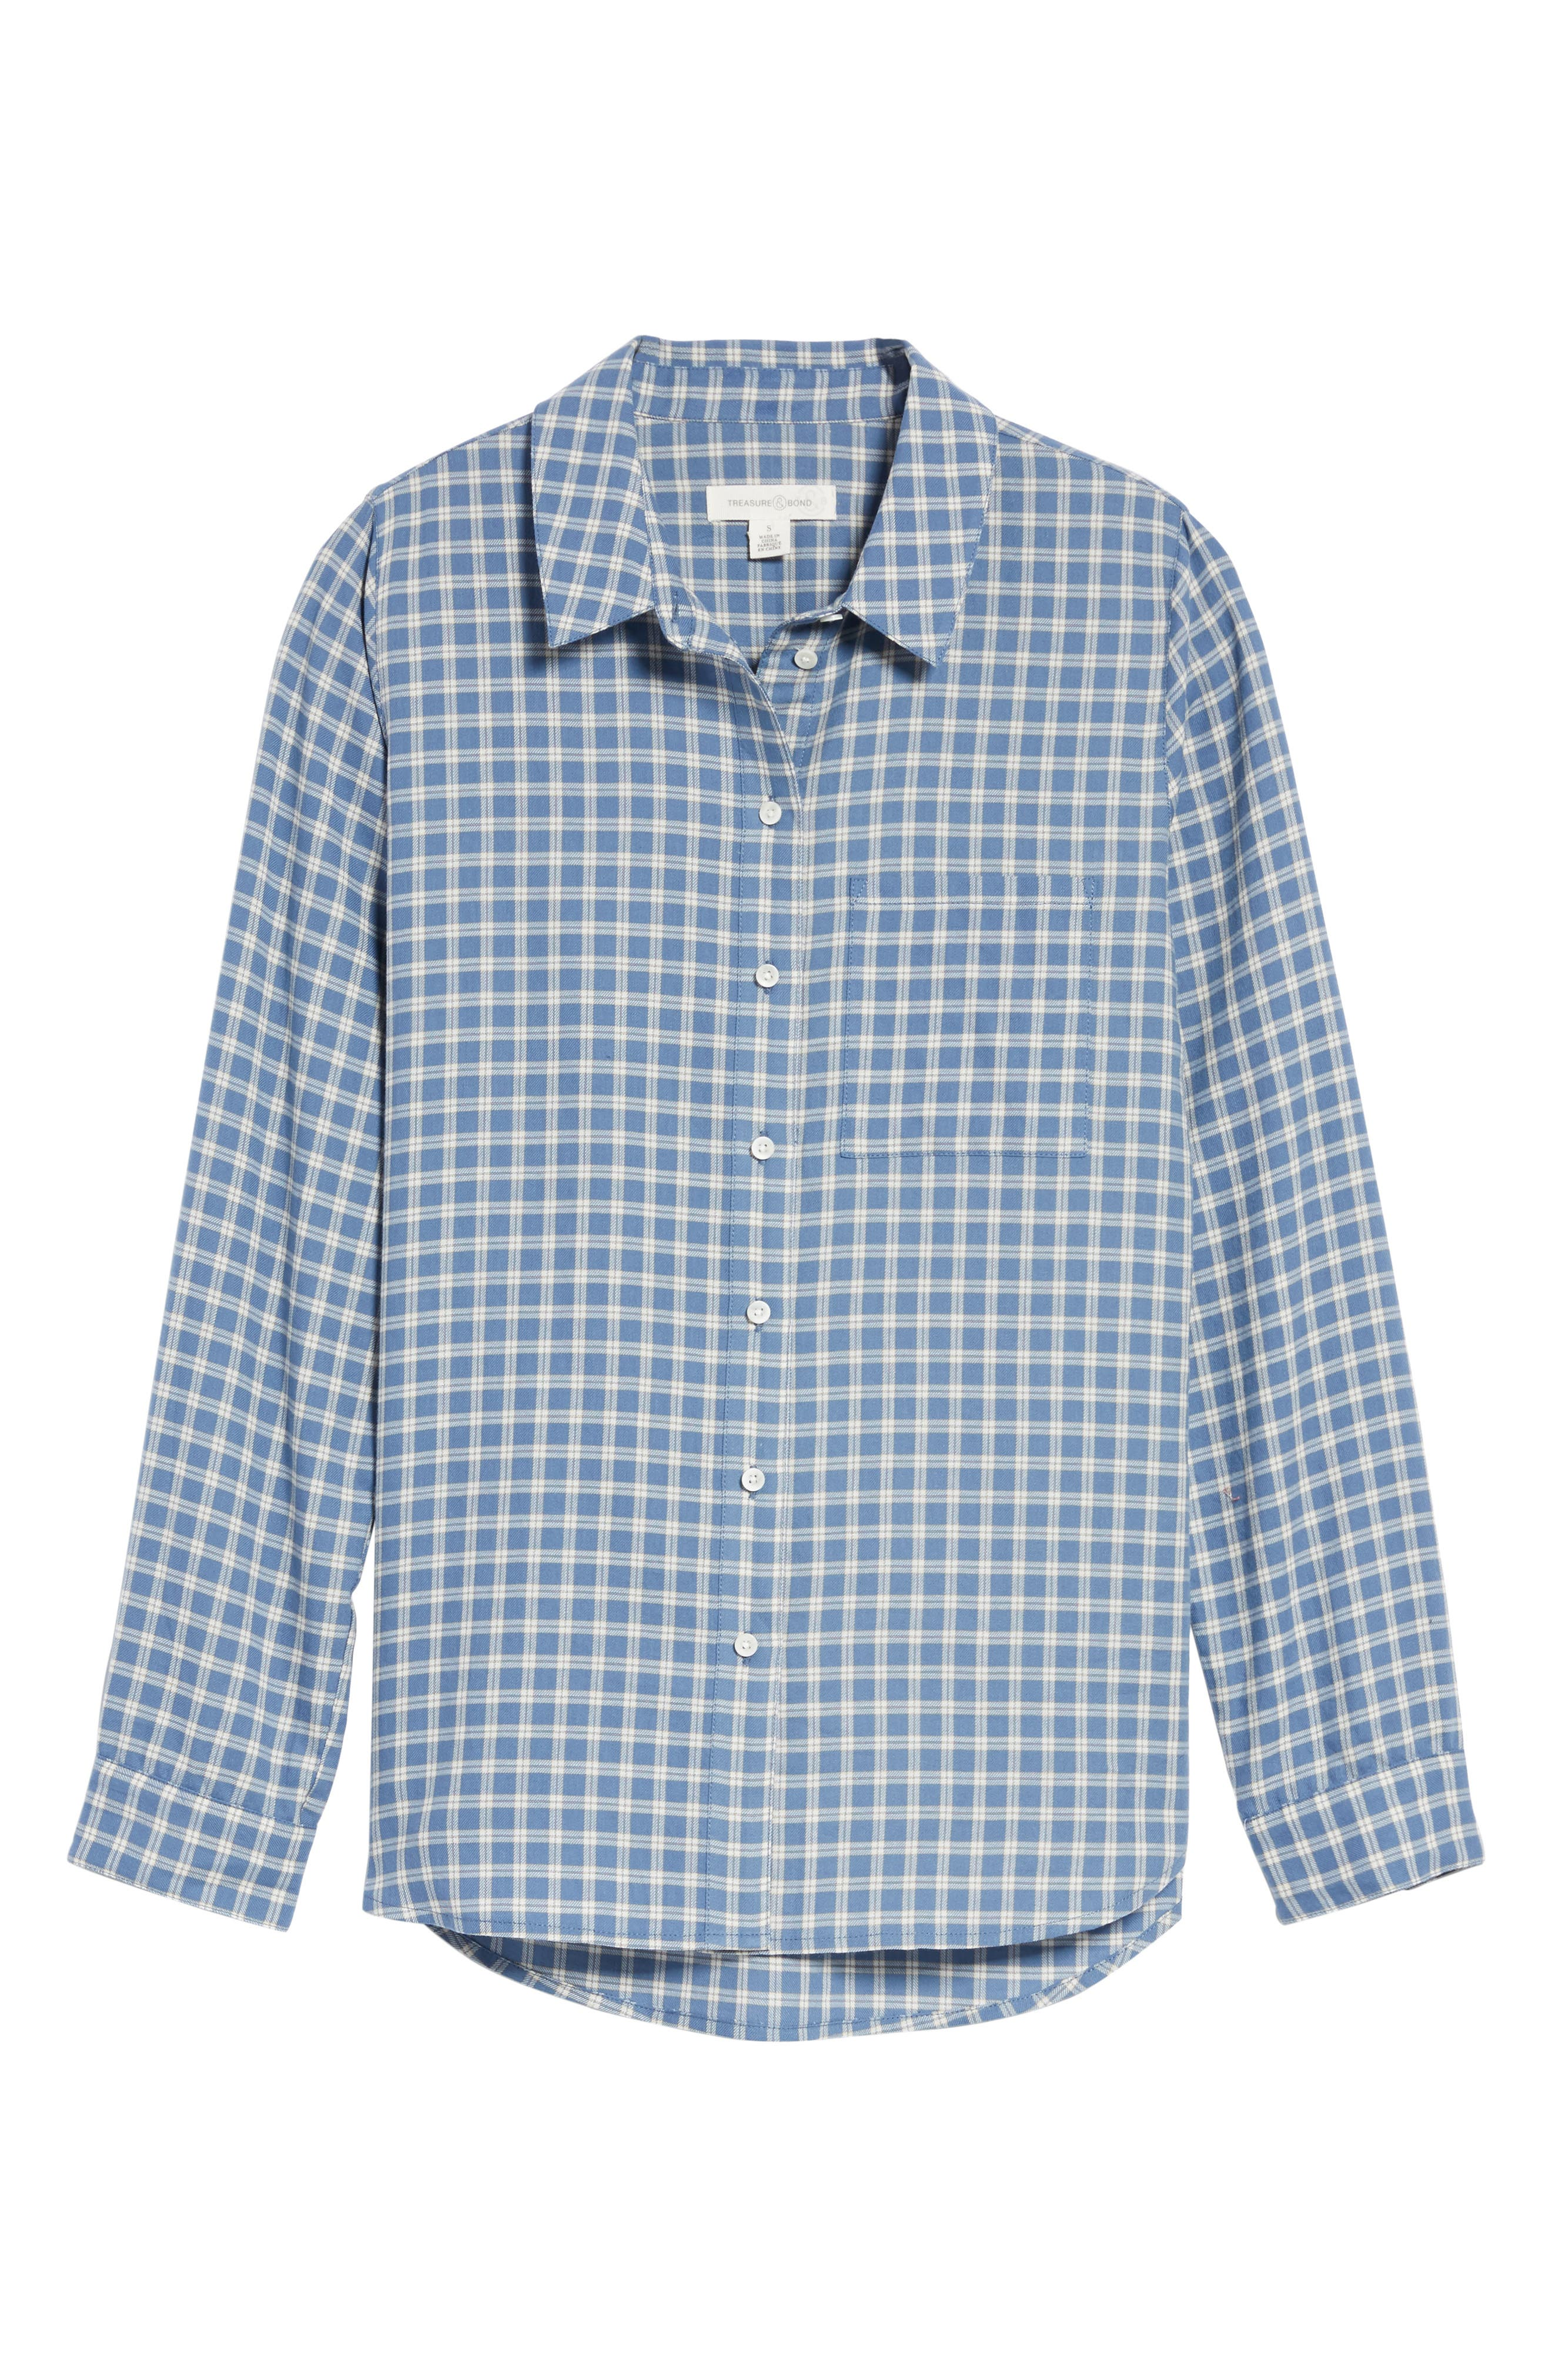 Classic Plaid Shirt,                             Alternate thumbnail 6, color,                             Blue Moonlight Grid Check